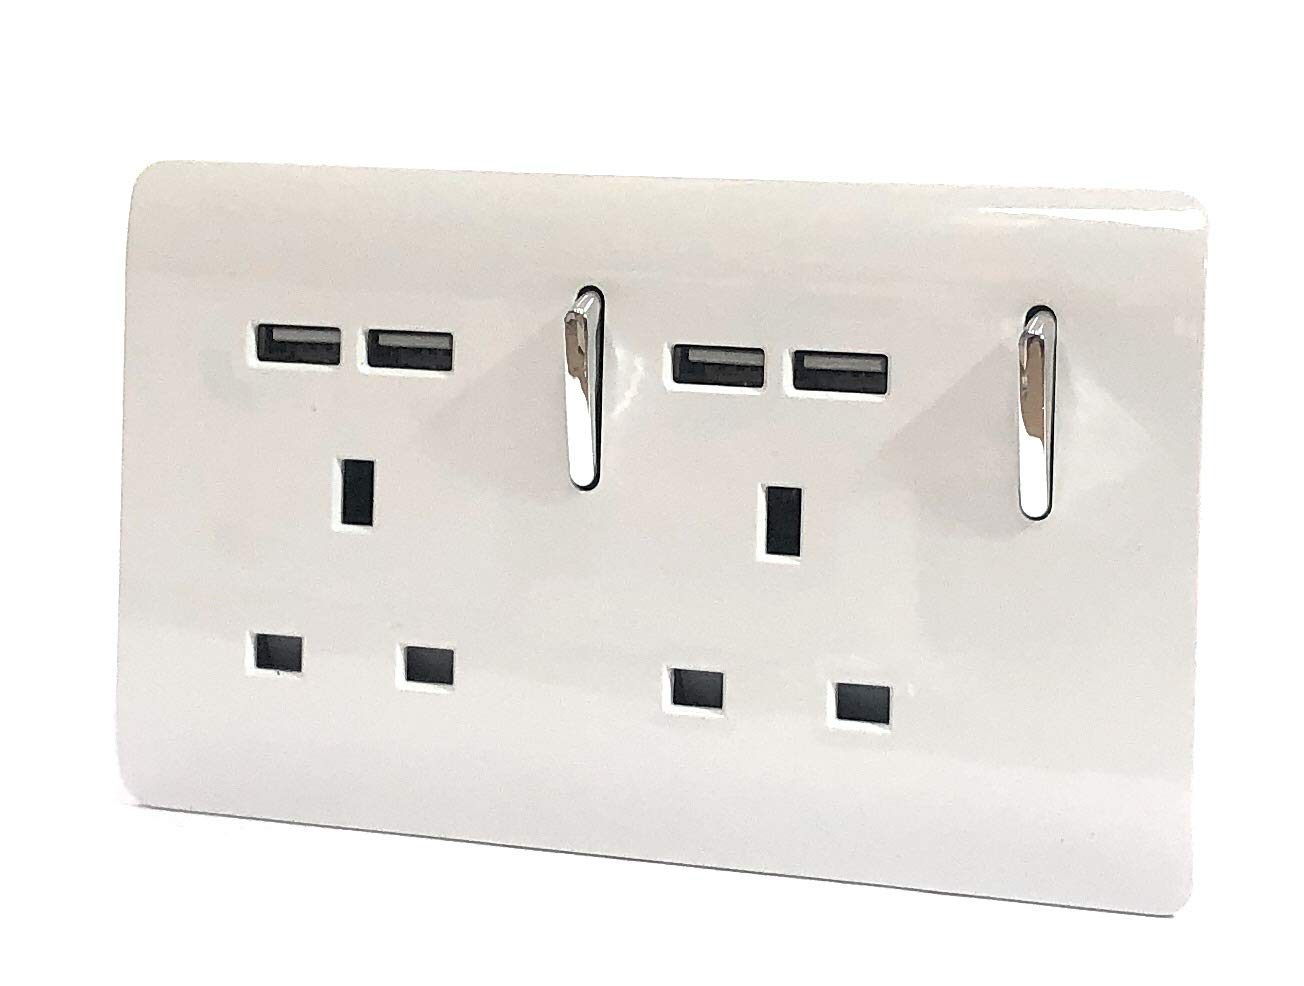 Trendi 2 Gang Artistic Modern Glossy 13 Amp 4 x 2.1mA USB Switched Tactile Plug Socket White